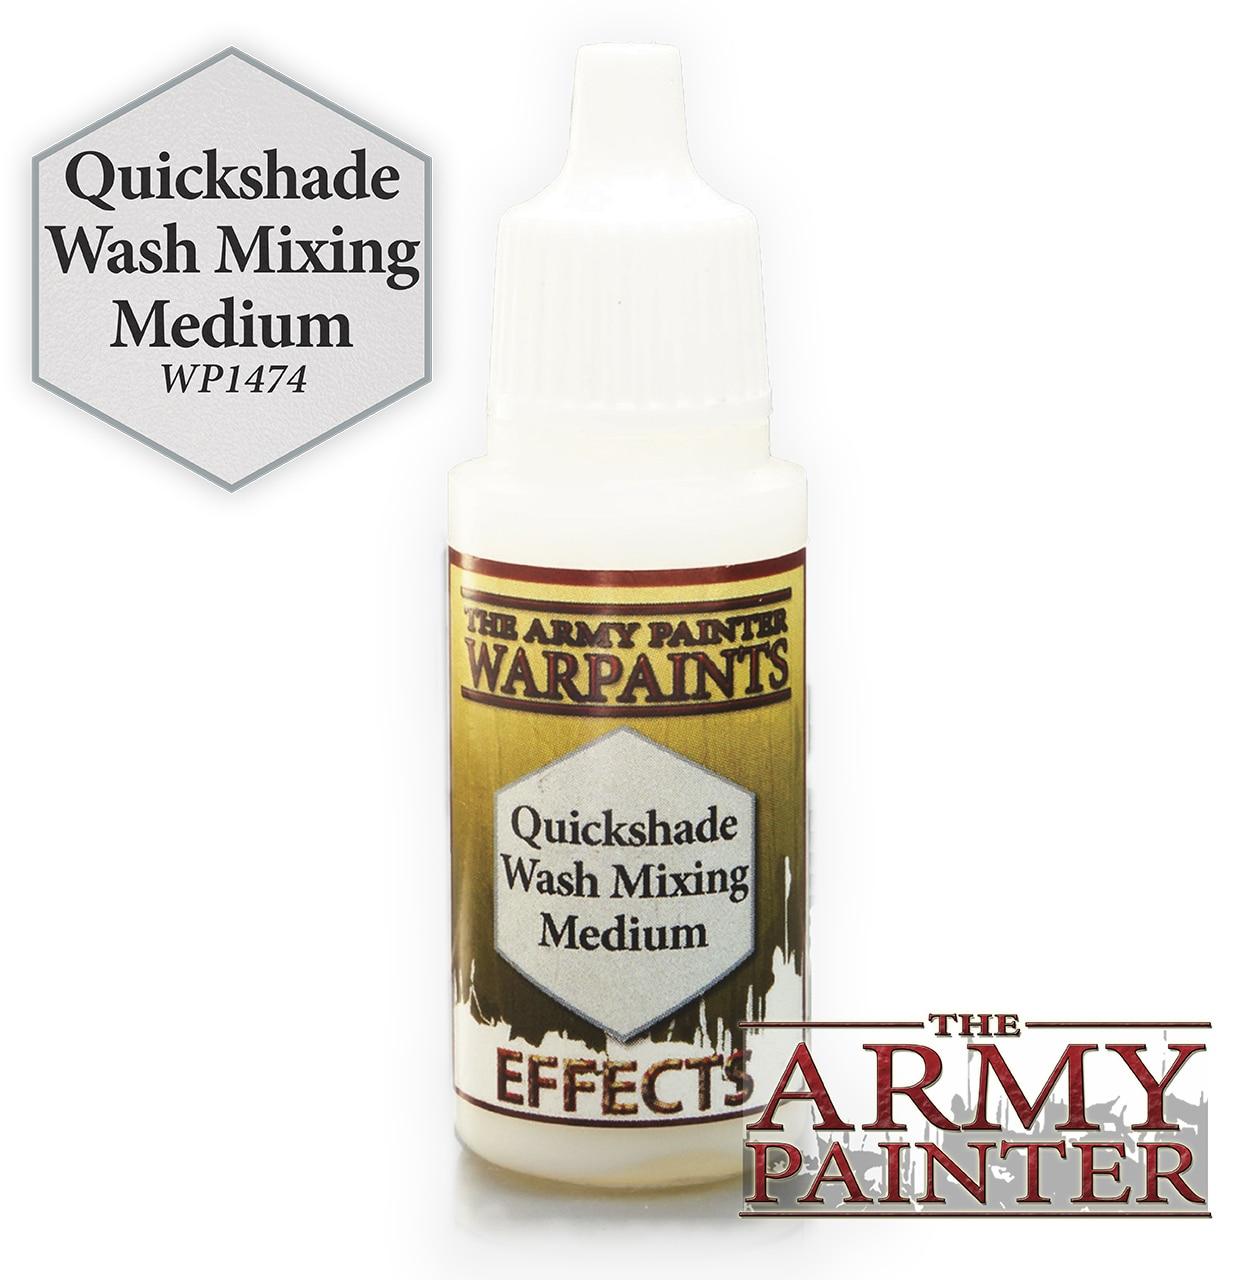 Army Painter Warpaint - Quickshade Wash Mixing Medium